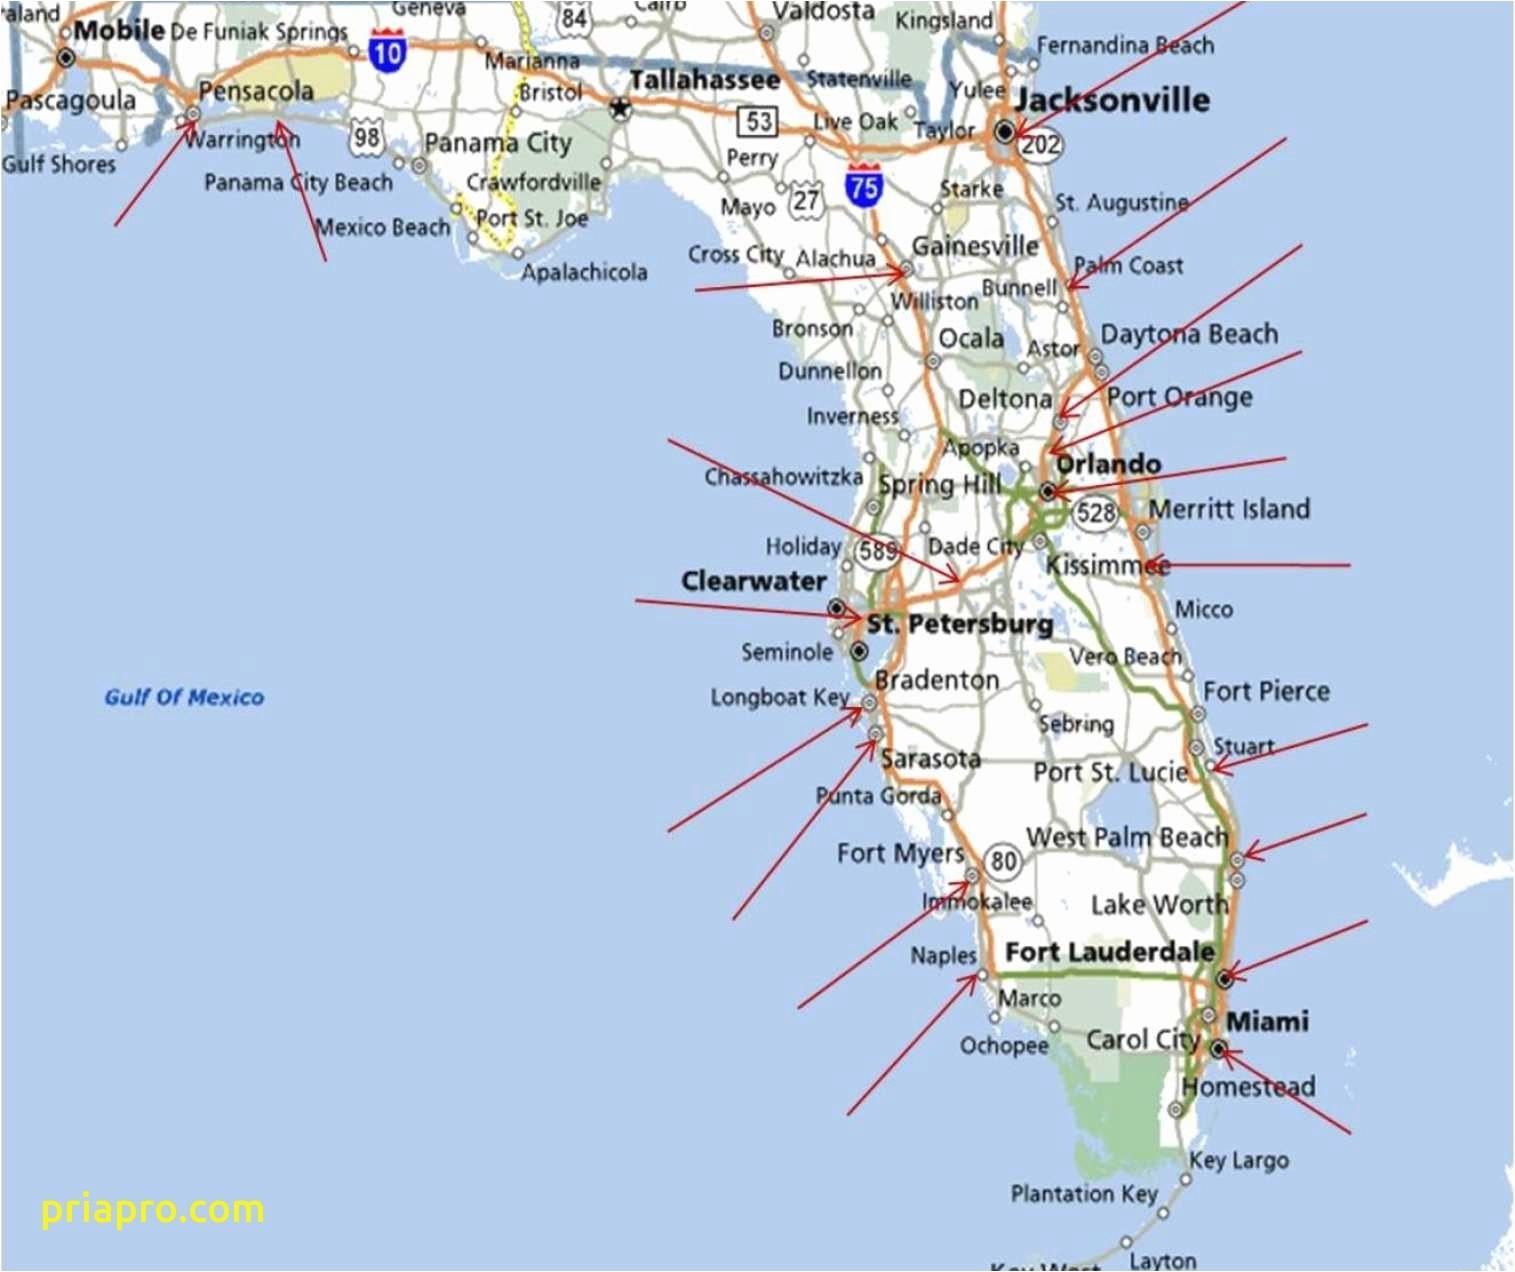 East Coast Beaches Map Inspirational Florida Beach Map Florida River - West Florida Beaches Map